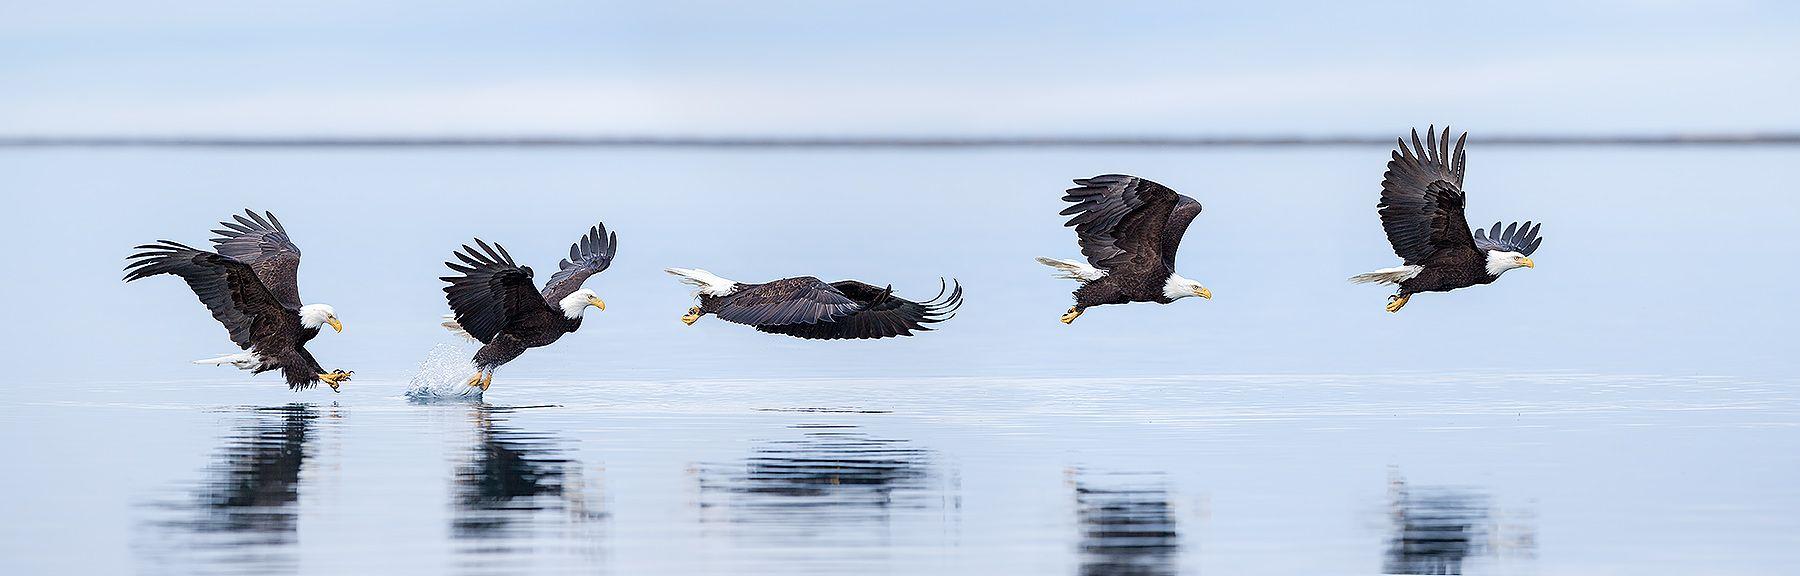 bald-eagles-fishing-sequence-ii_e7t9766-kachemak-bay-homer-alaska-usa.jpg